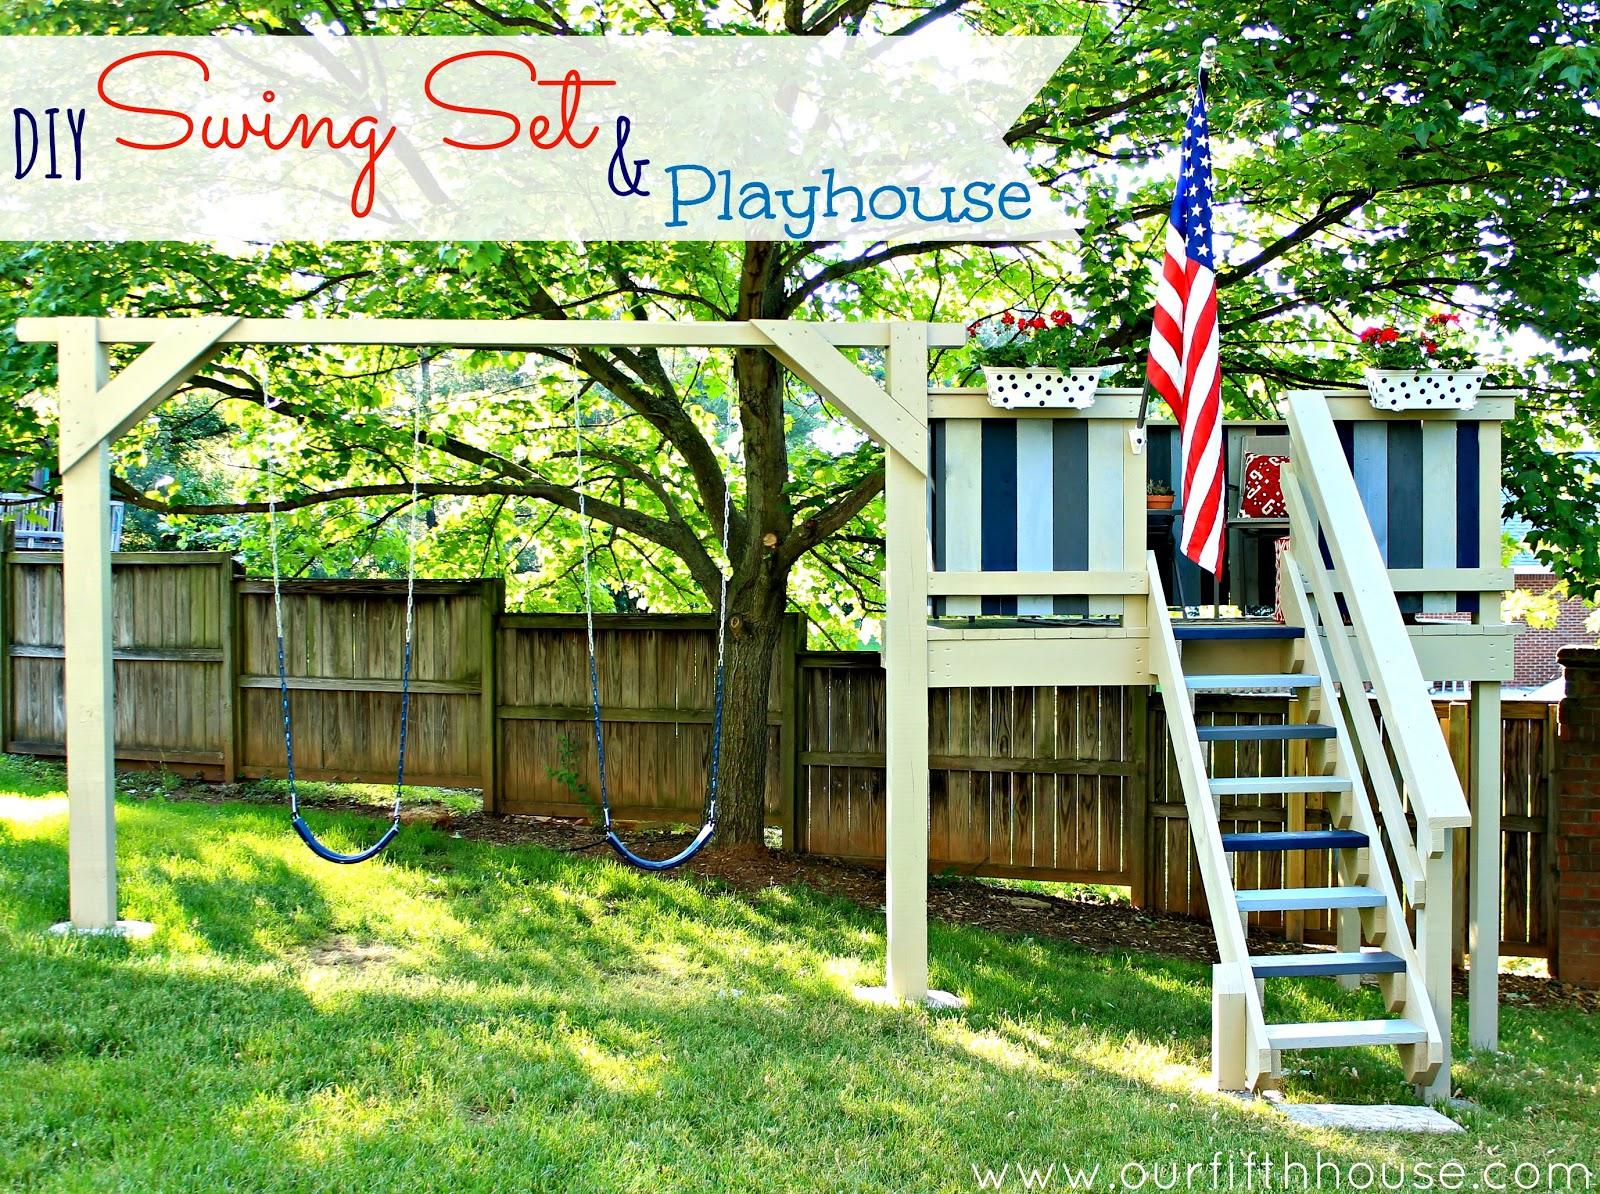 Diy Swing Set Playhouse